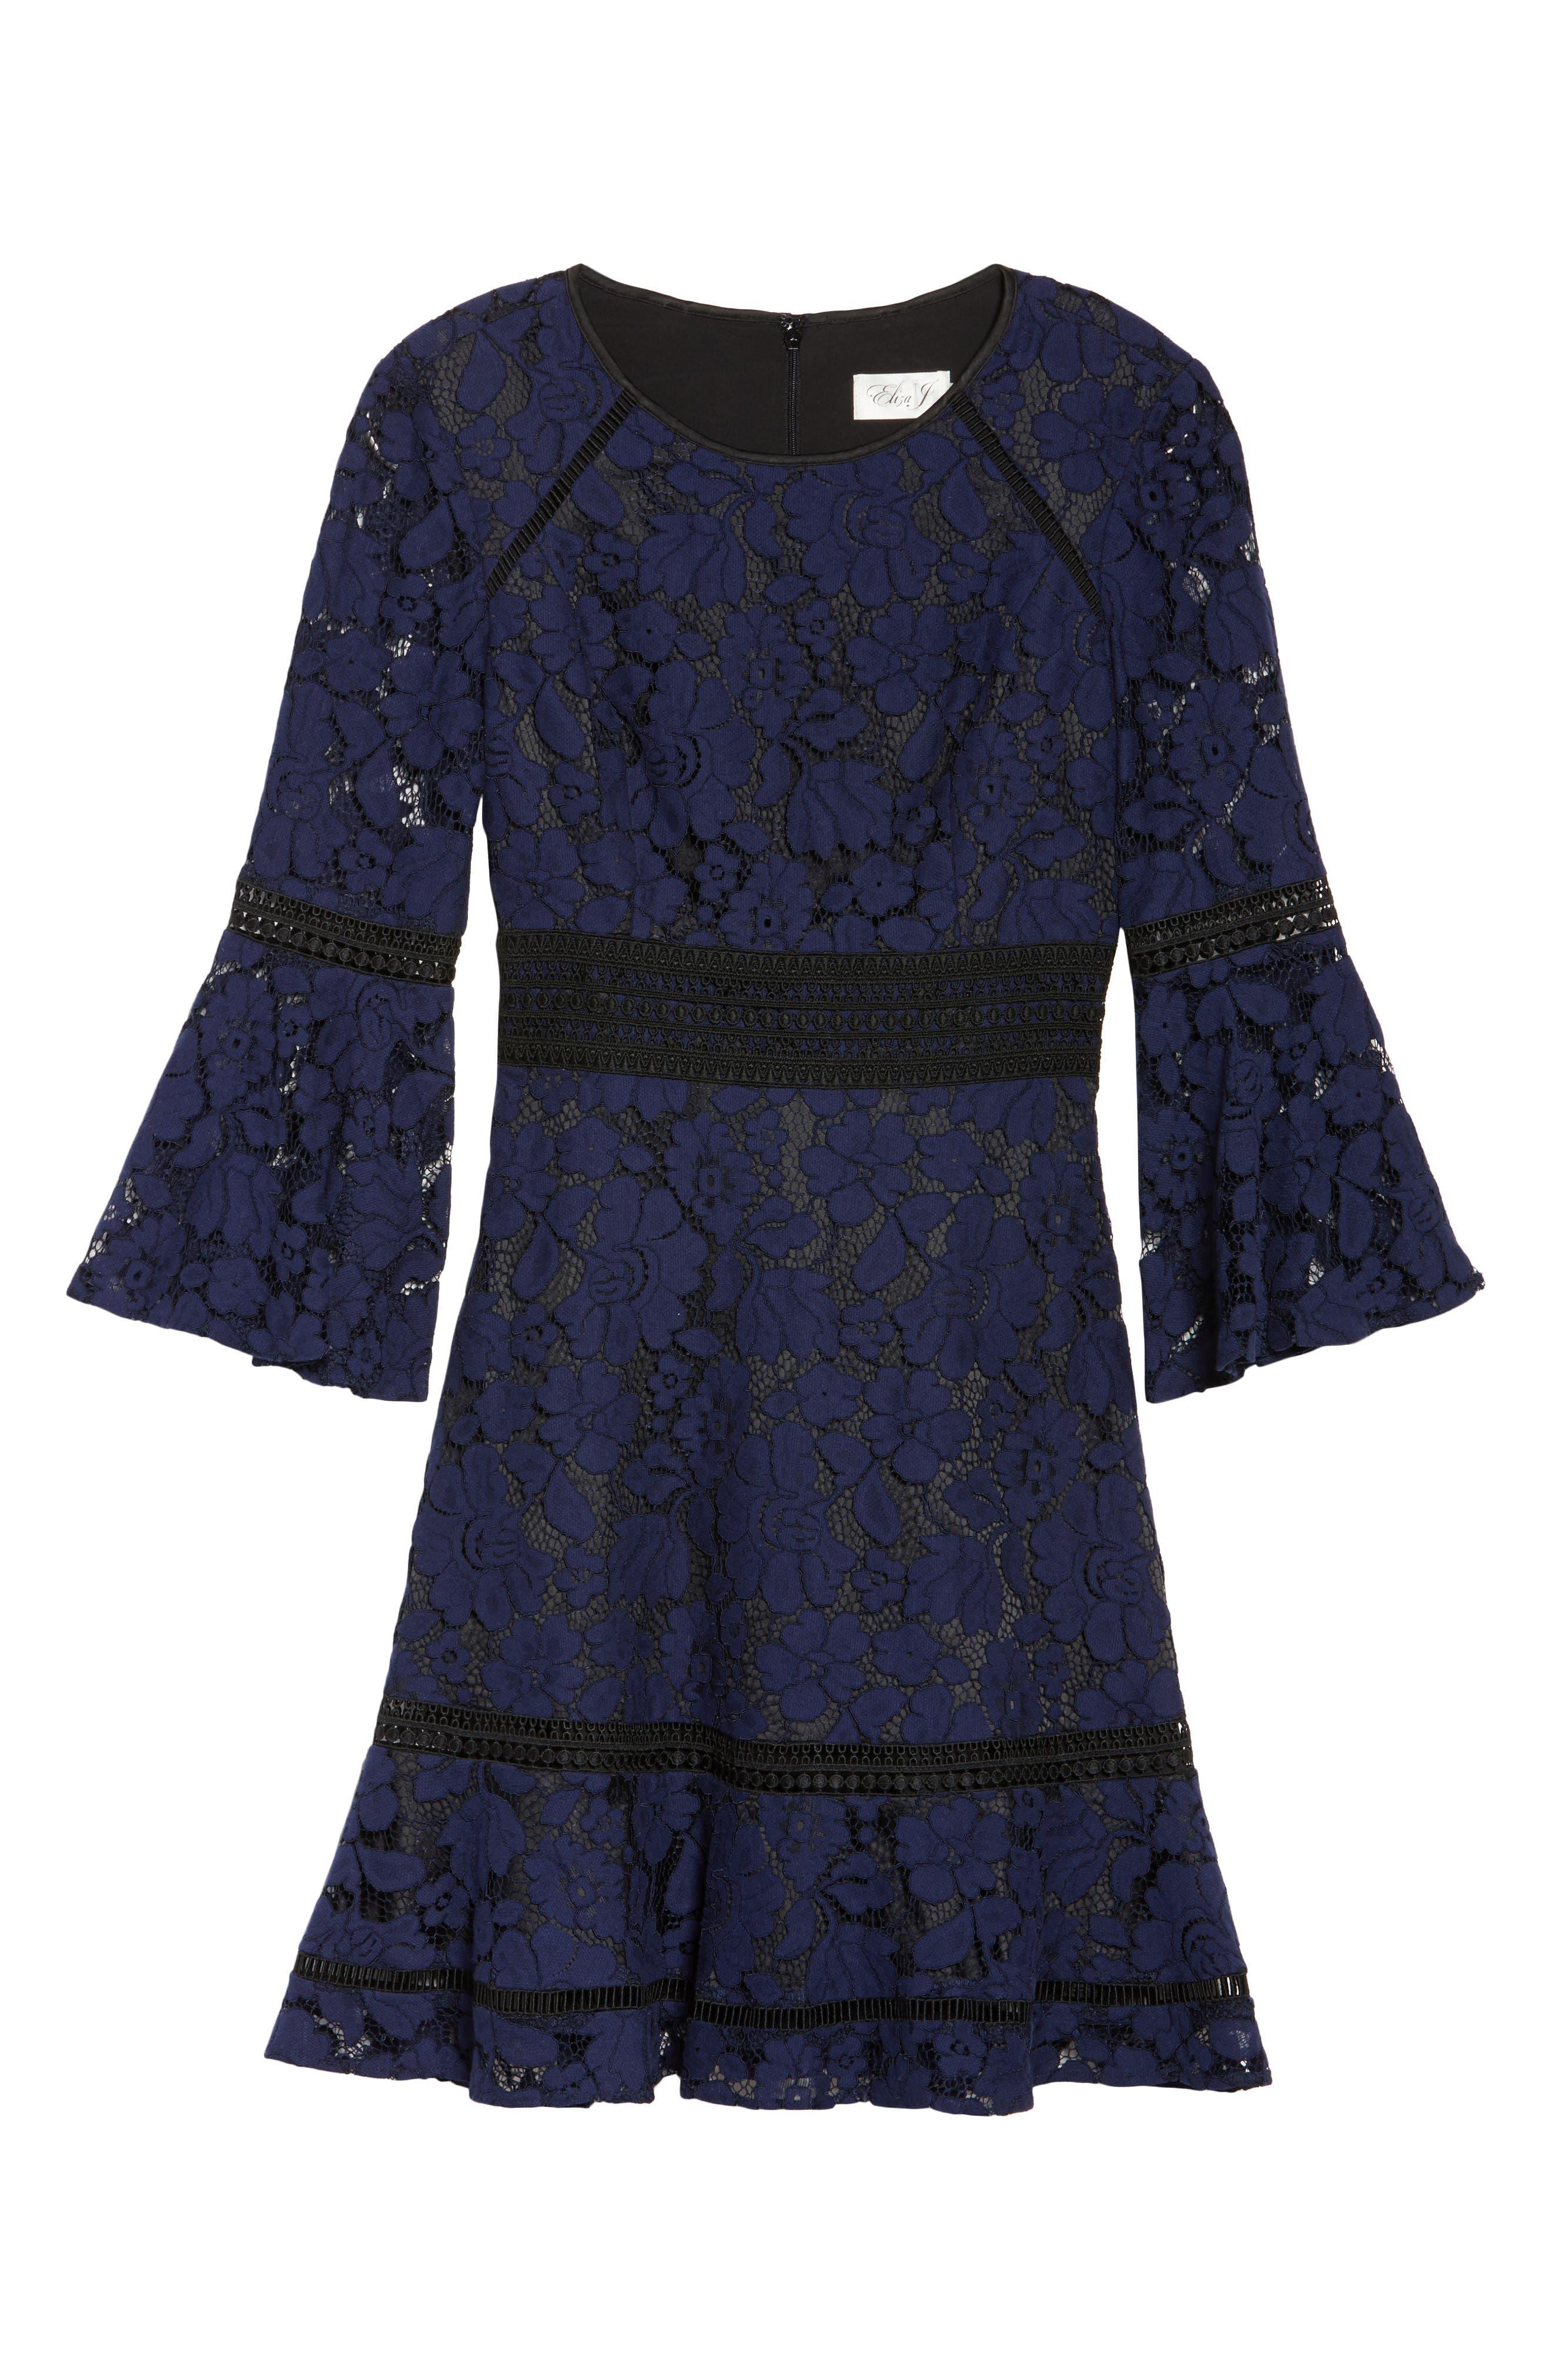 Bell Sleeve Lace Dress,                             Alternate thumbnail 6, color,                             Navy/ Black